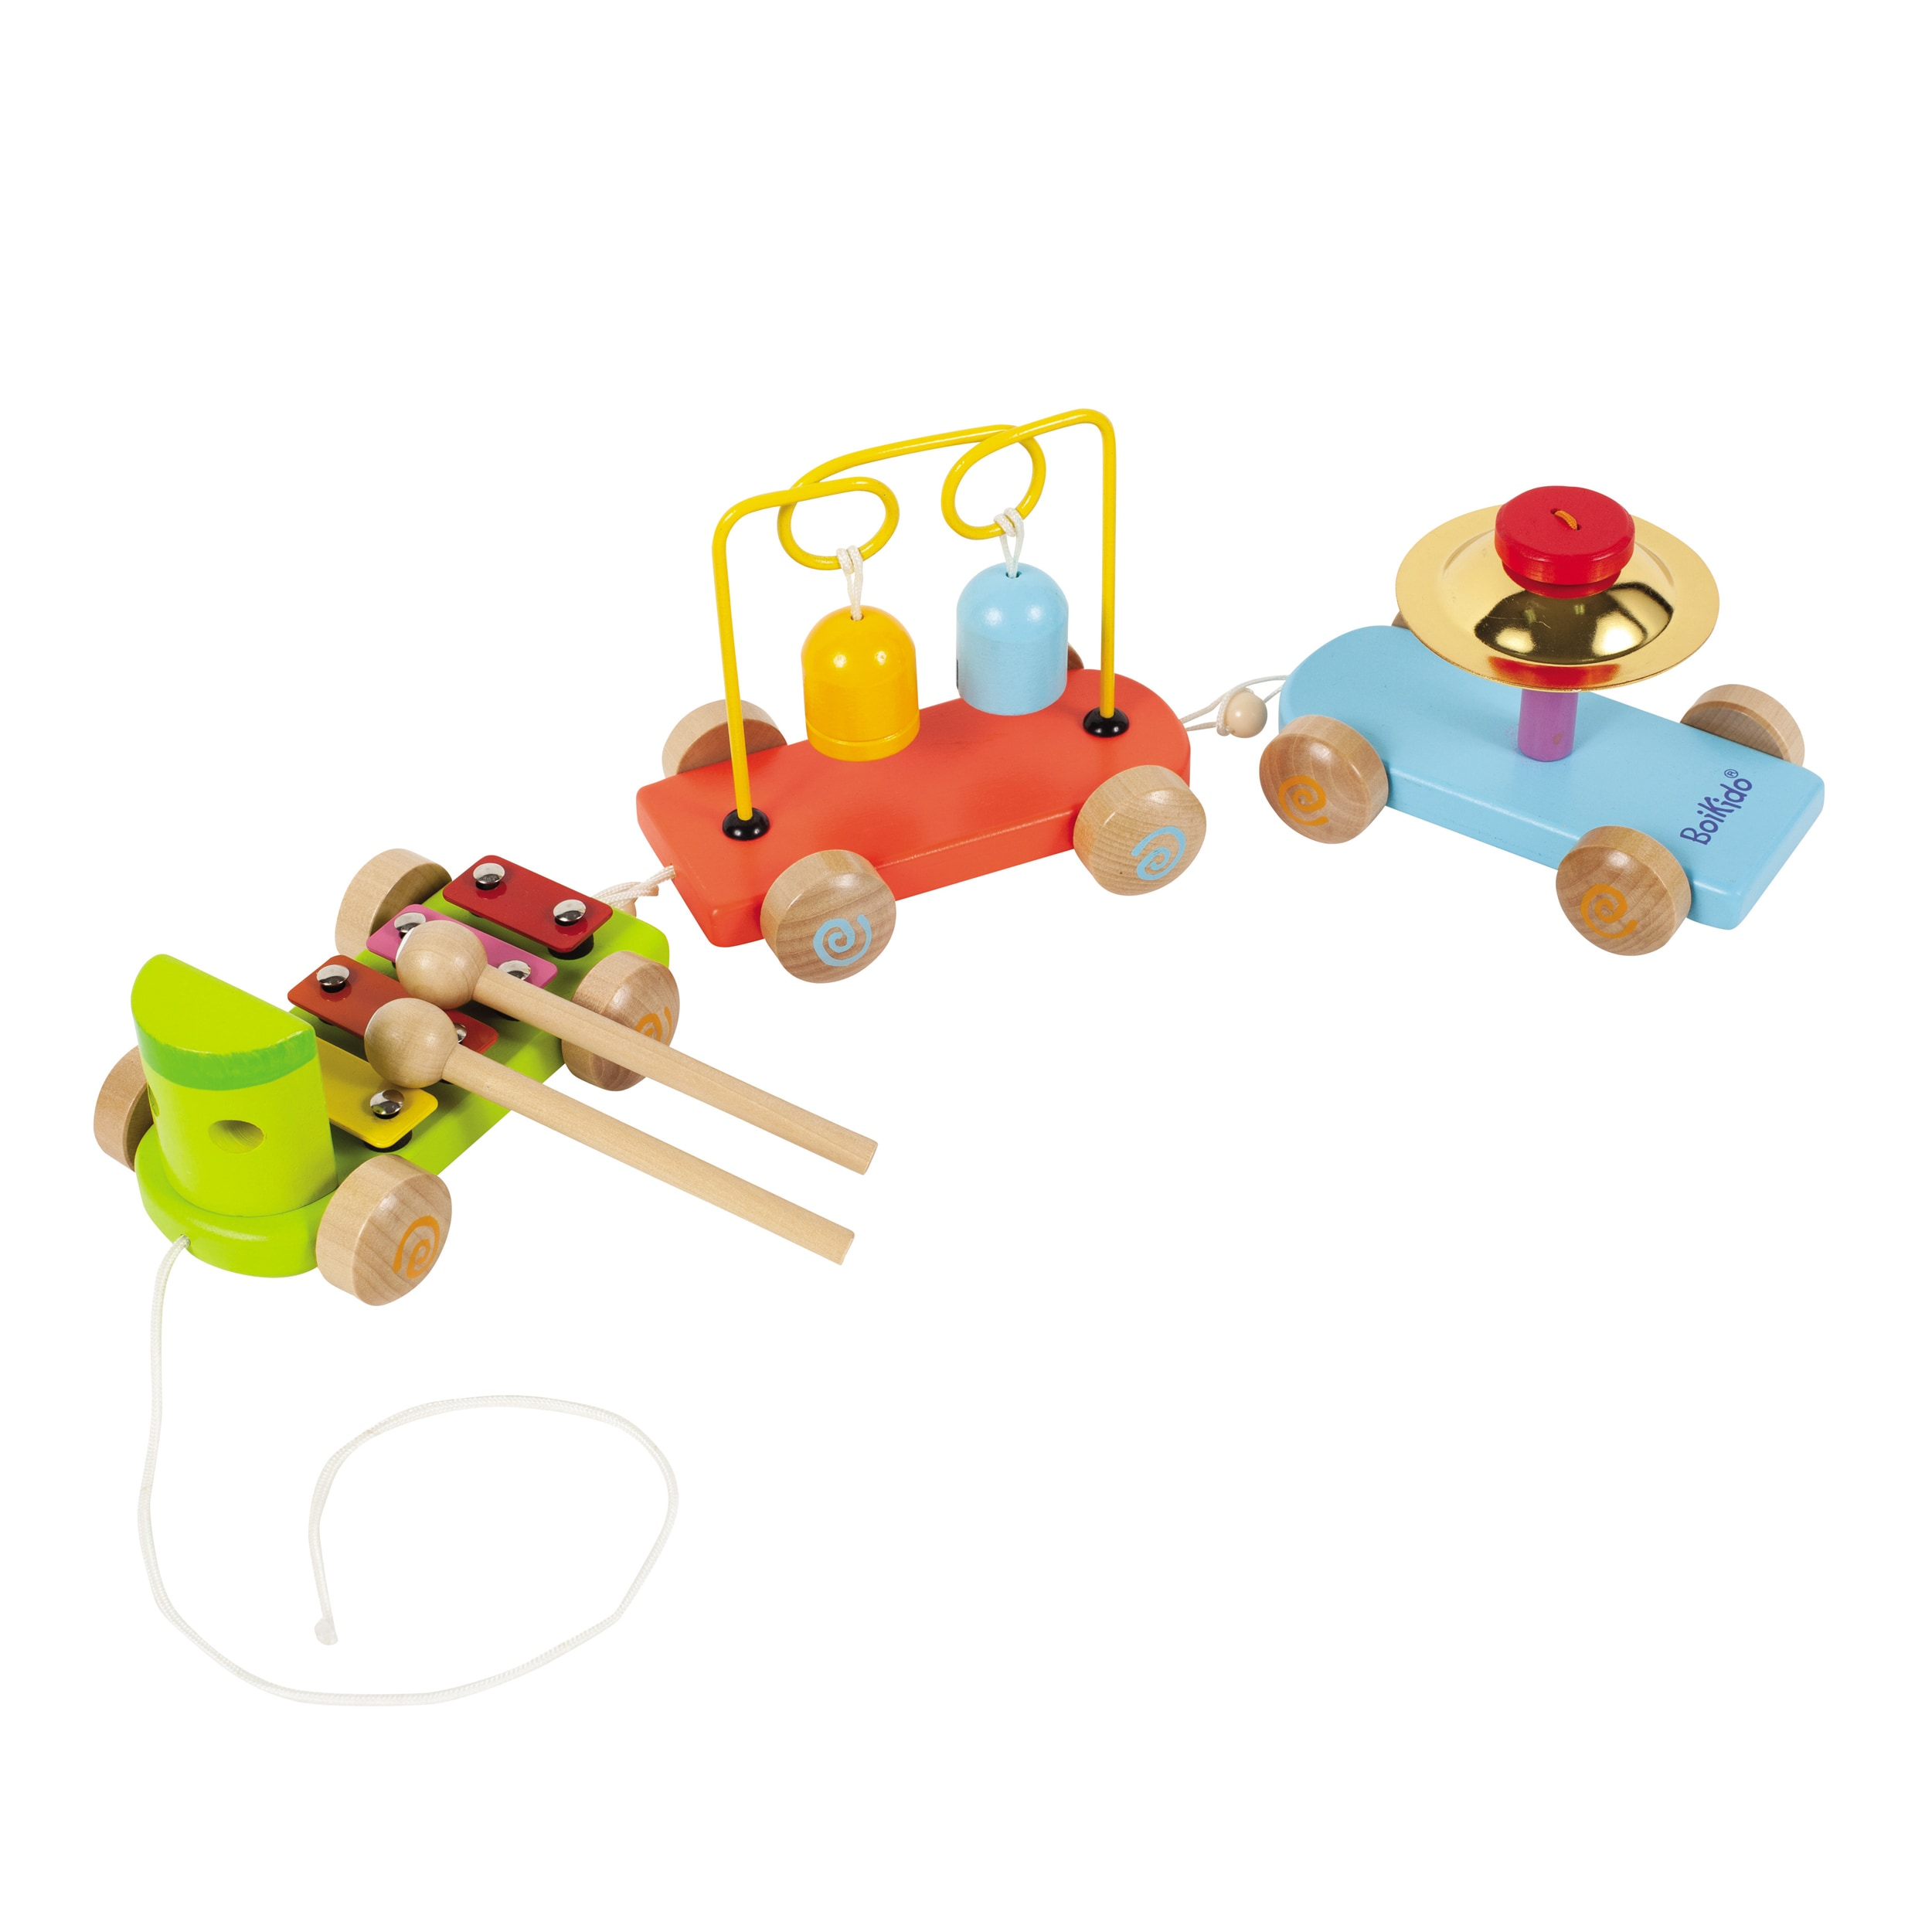 Boikido Wooden Musical Train (1), Multi